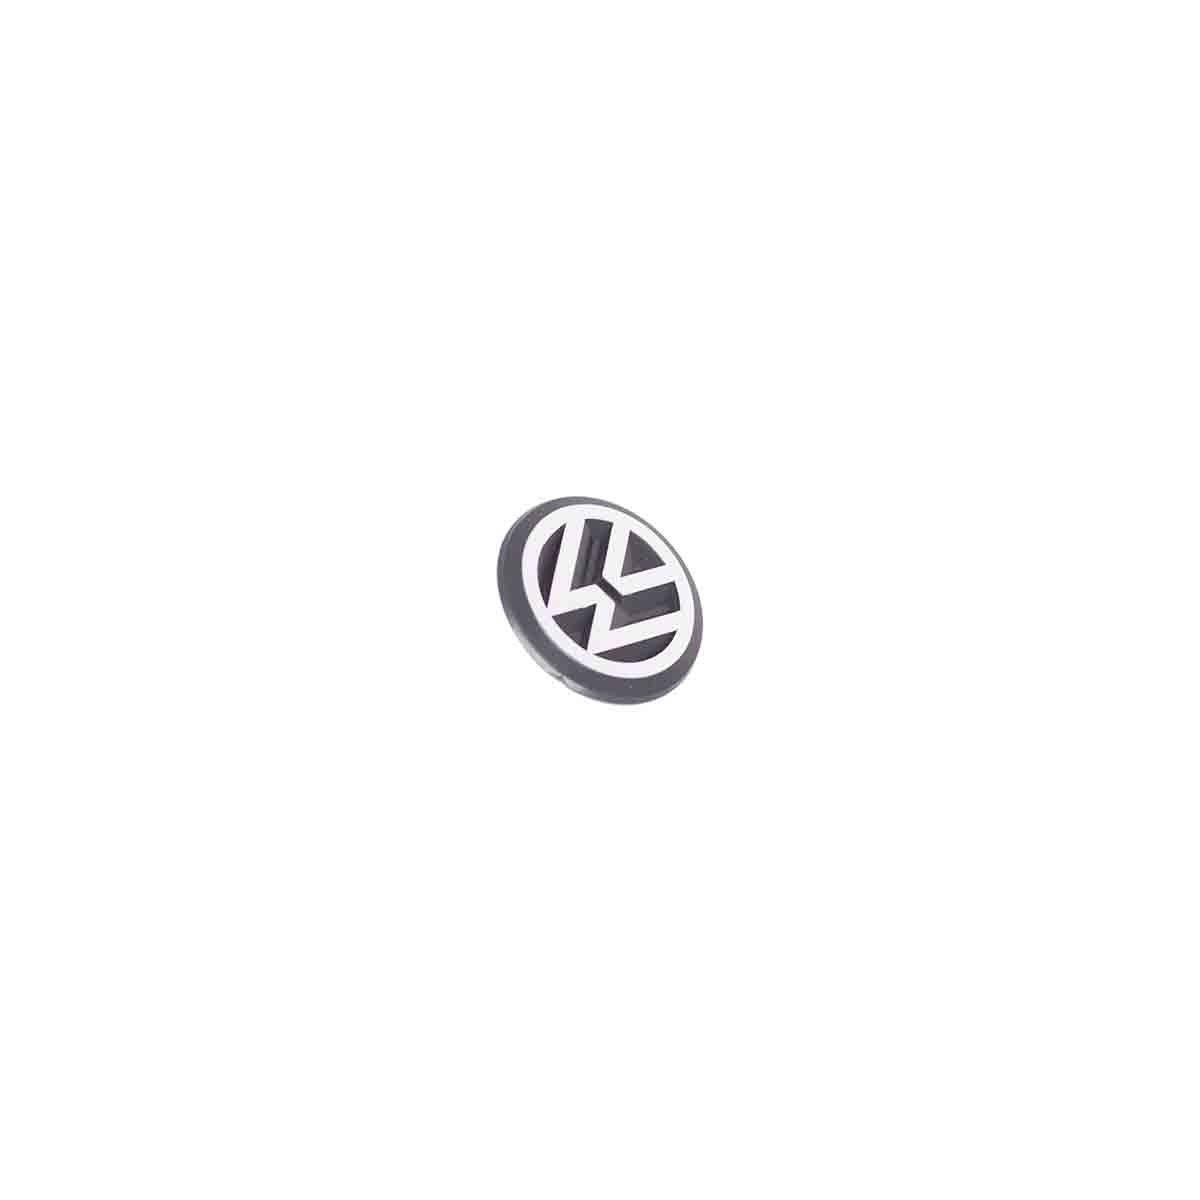 Emblema VW Porta Malas Gol / Voyage / Parati / Saveiro / Todos 83/90